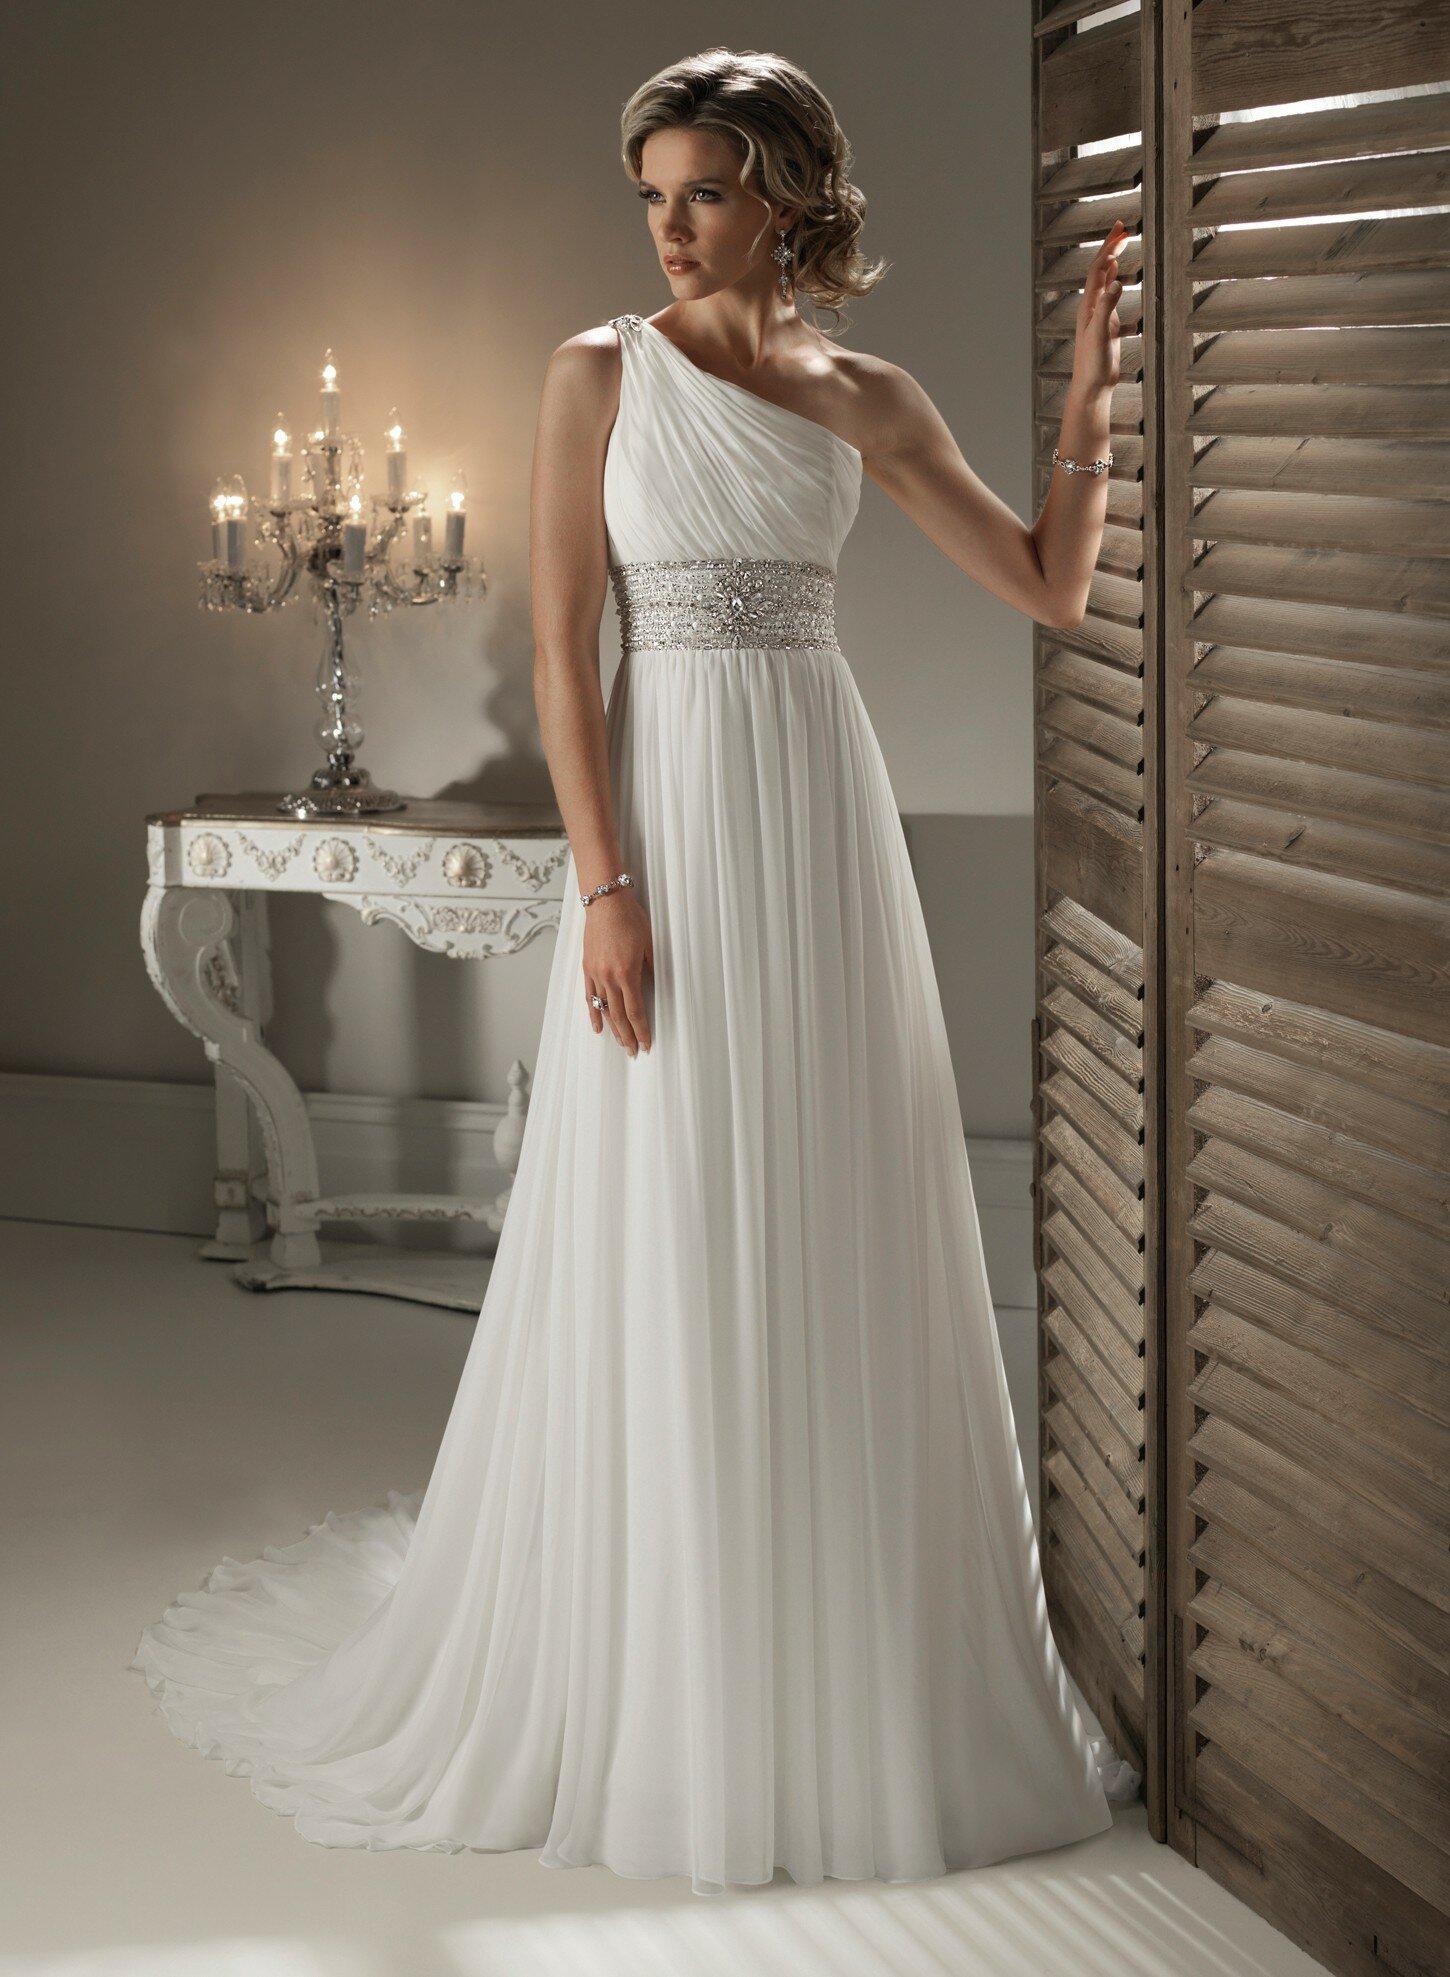 dresses for weddings nice dresses for wedding nice dress for wedding ocodeacom summer dresses wedding guests 7 nice dress for wedding